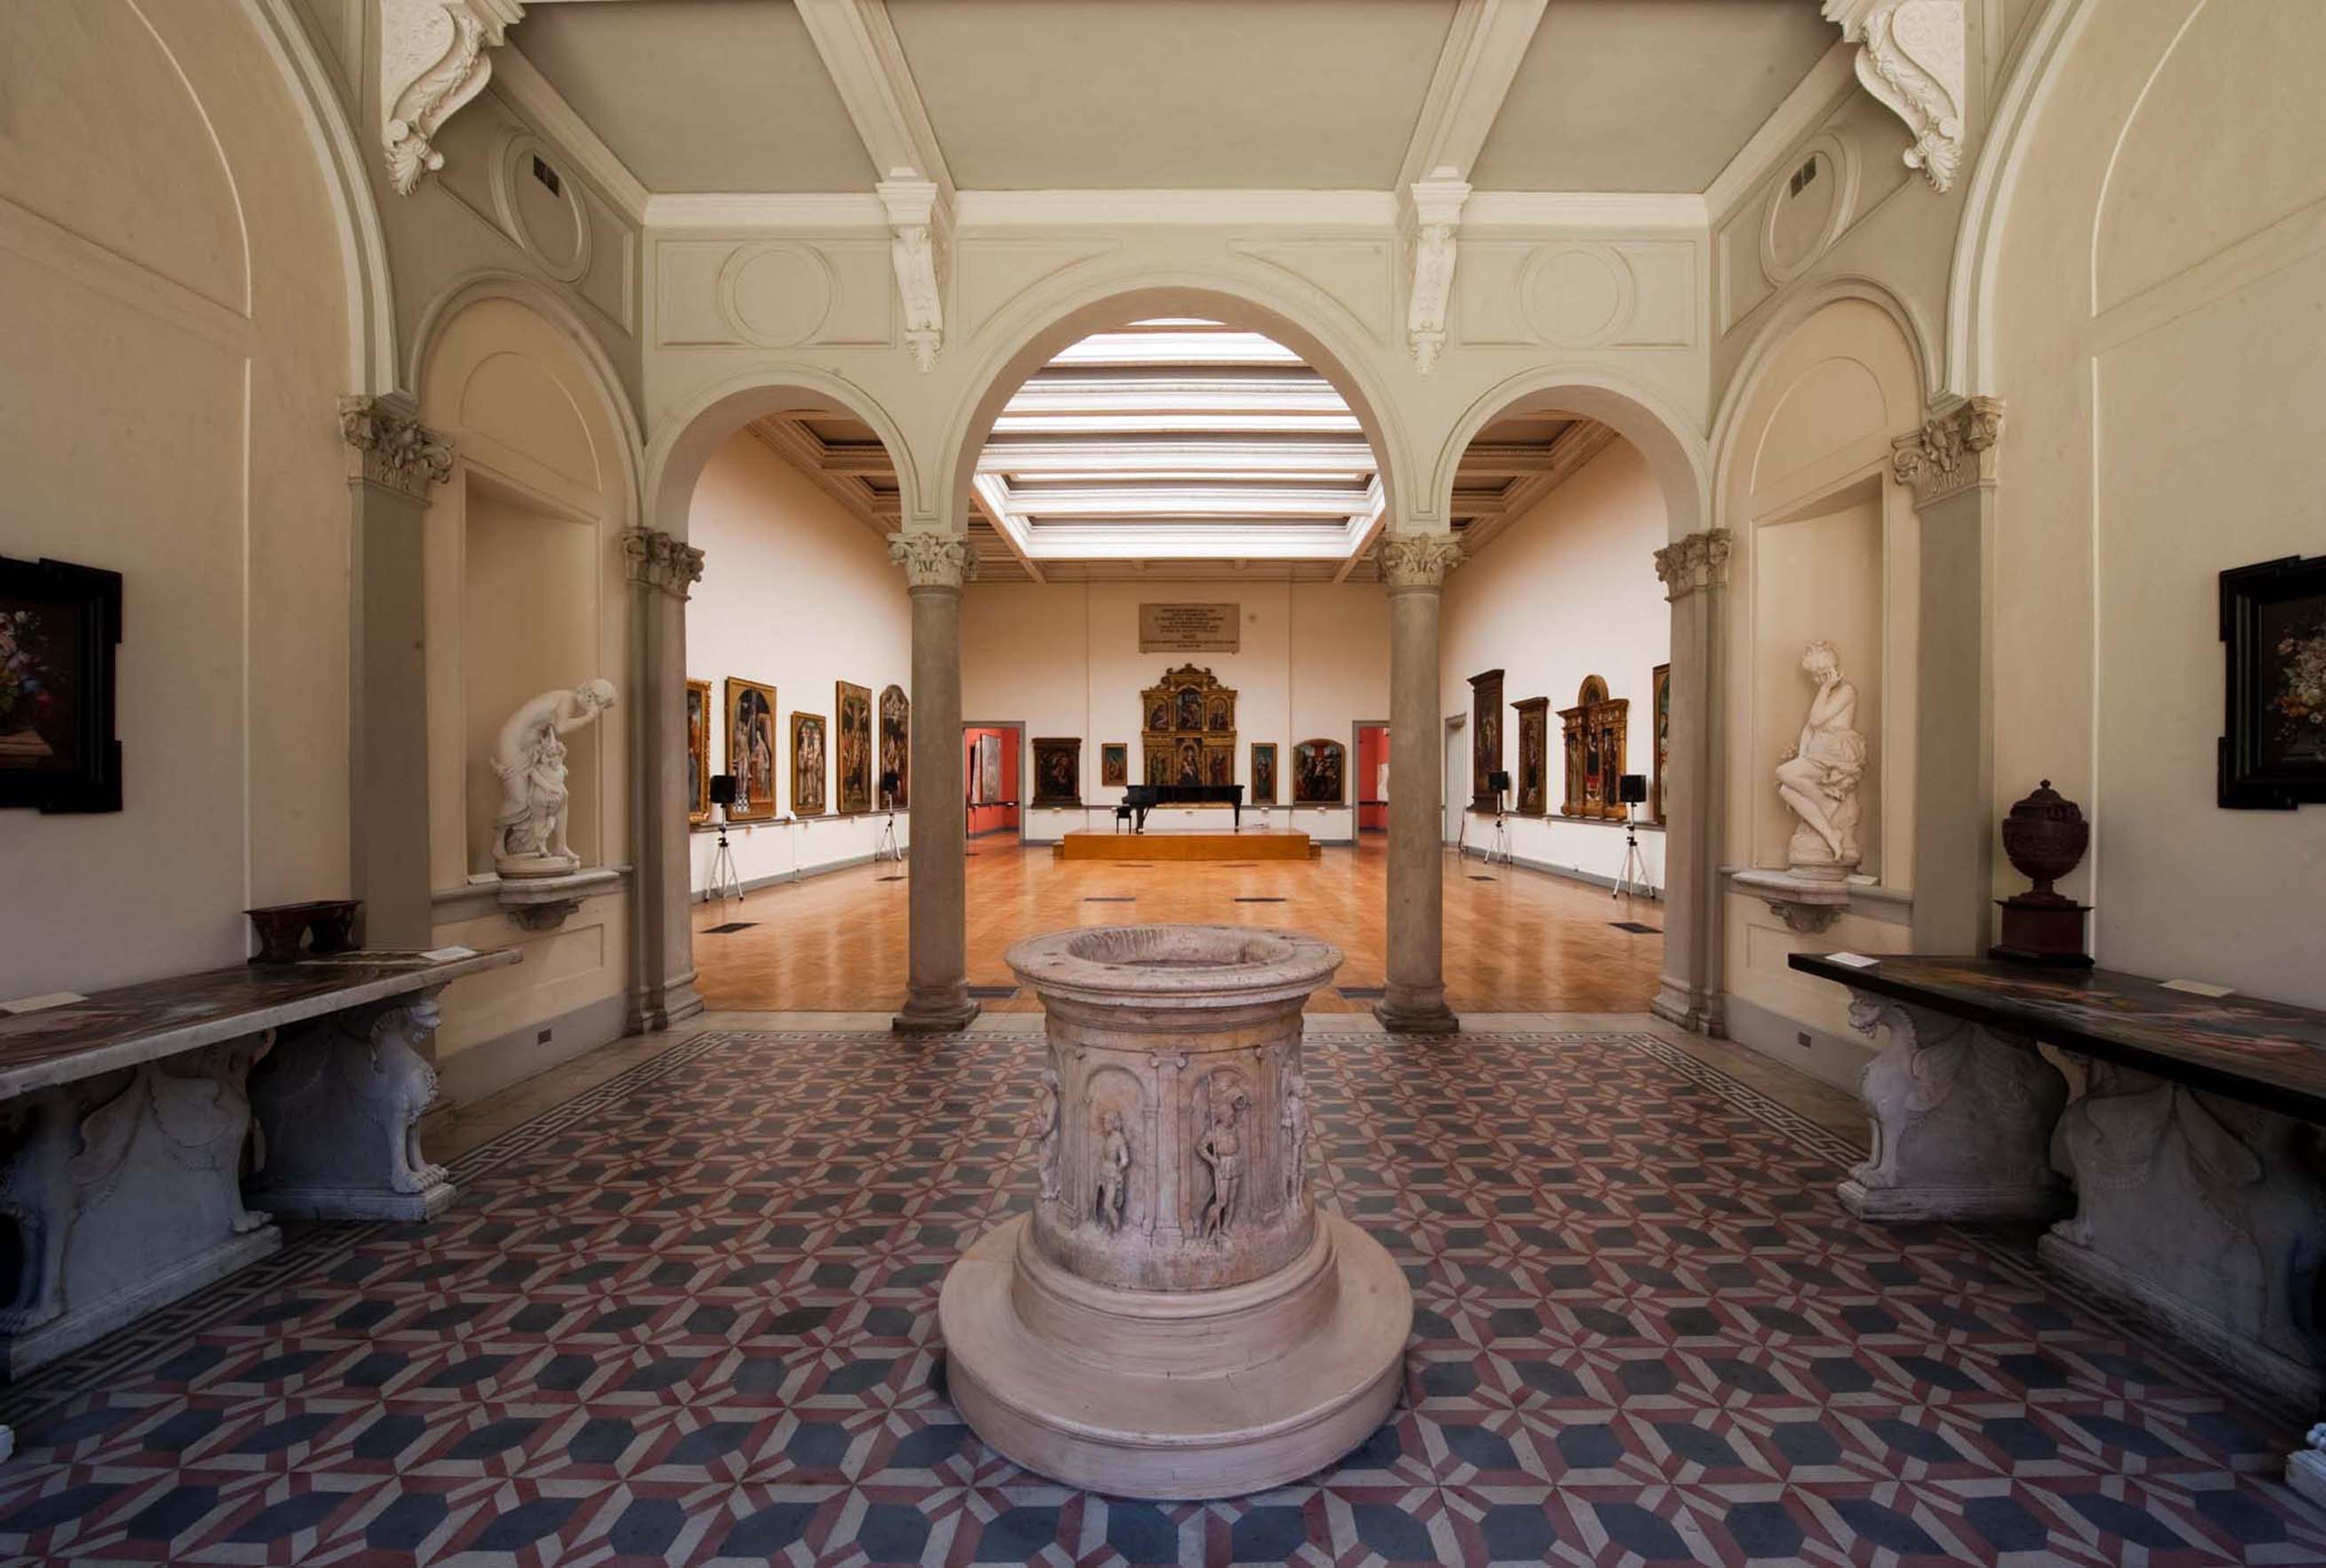 Italia Arreda Borgaro Torinese museo borgogna - vercelli | linkedin